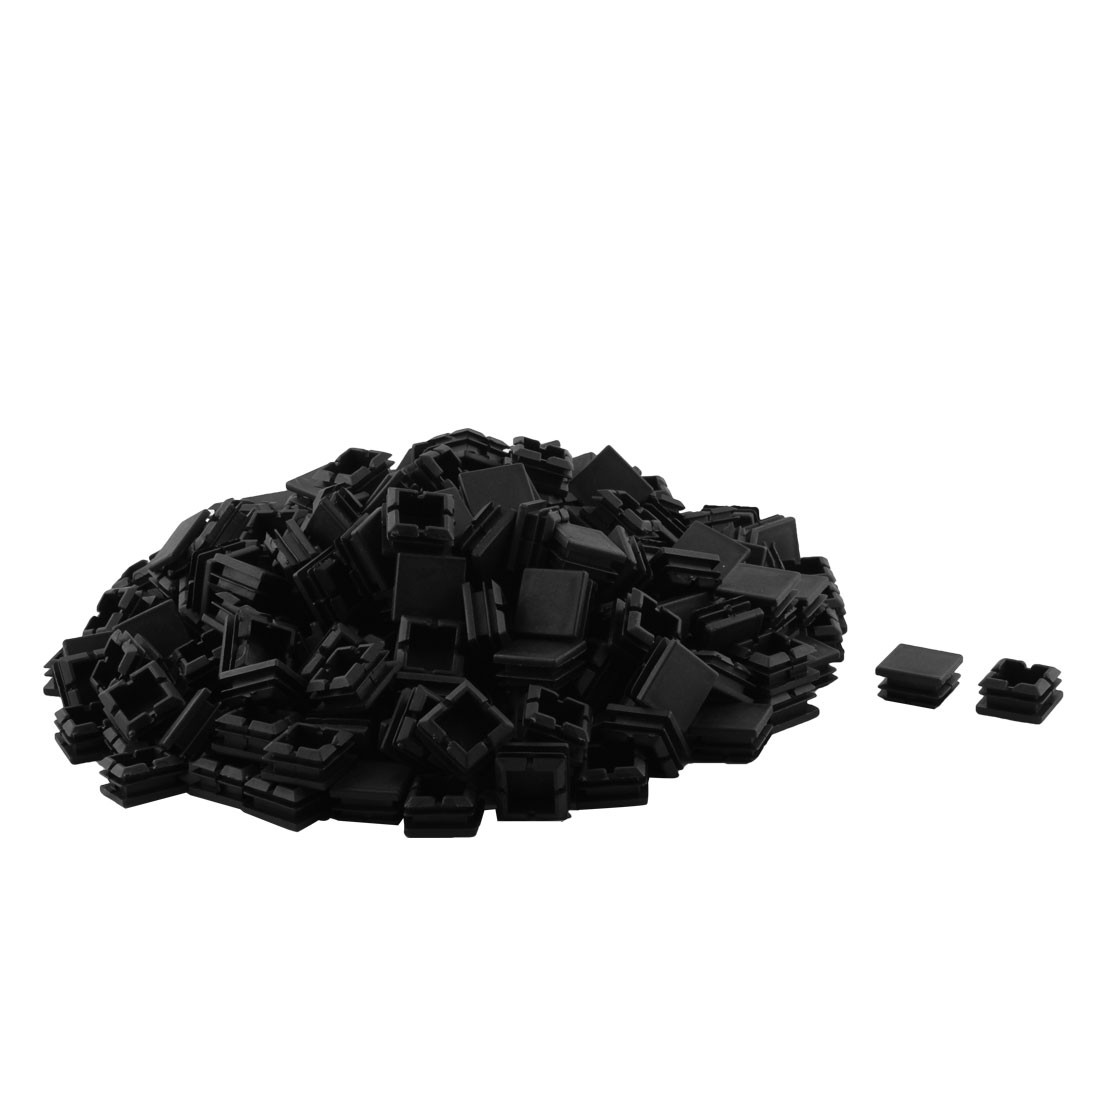 Plastic Square Table Chair Leg Feet Tubing Tube Insert Caps Covers Black 25 x 25mm 250pcs